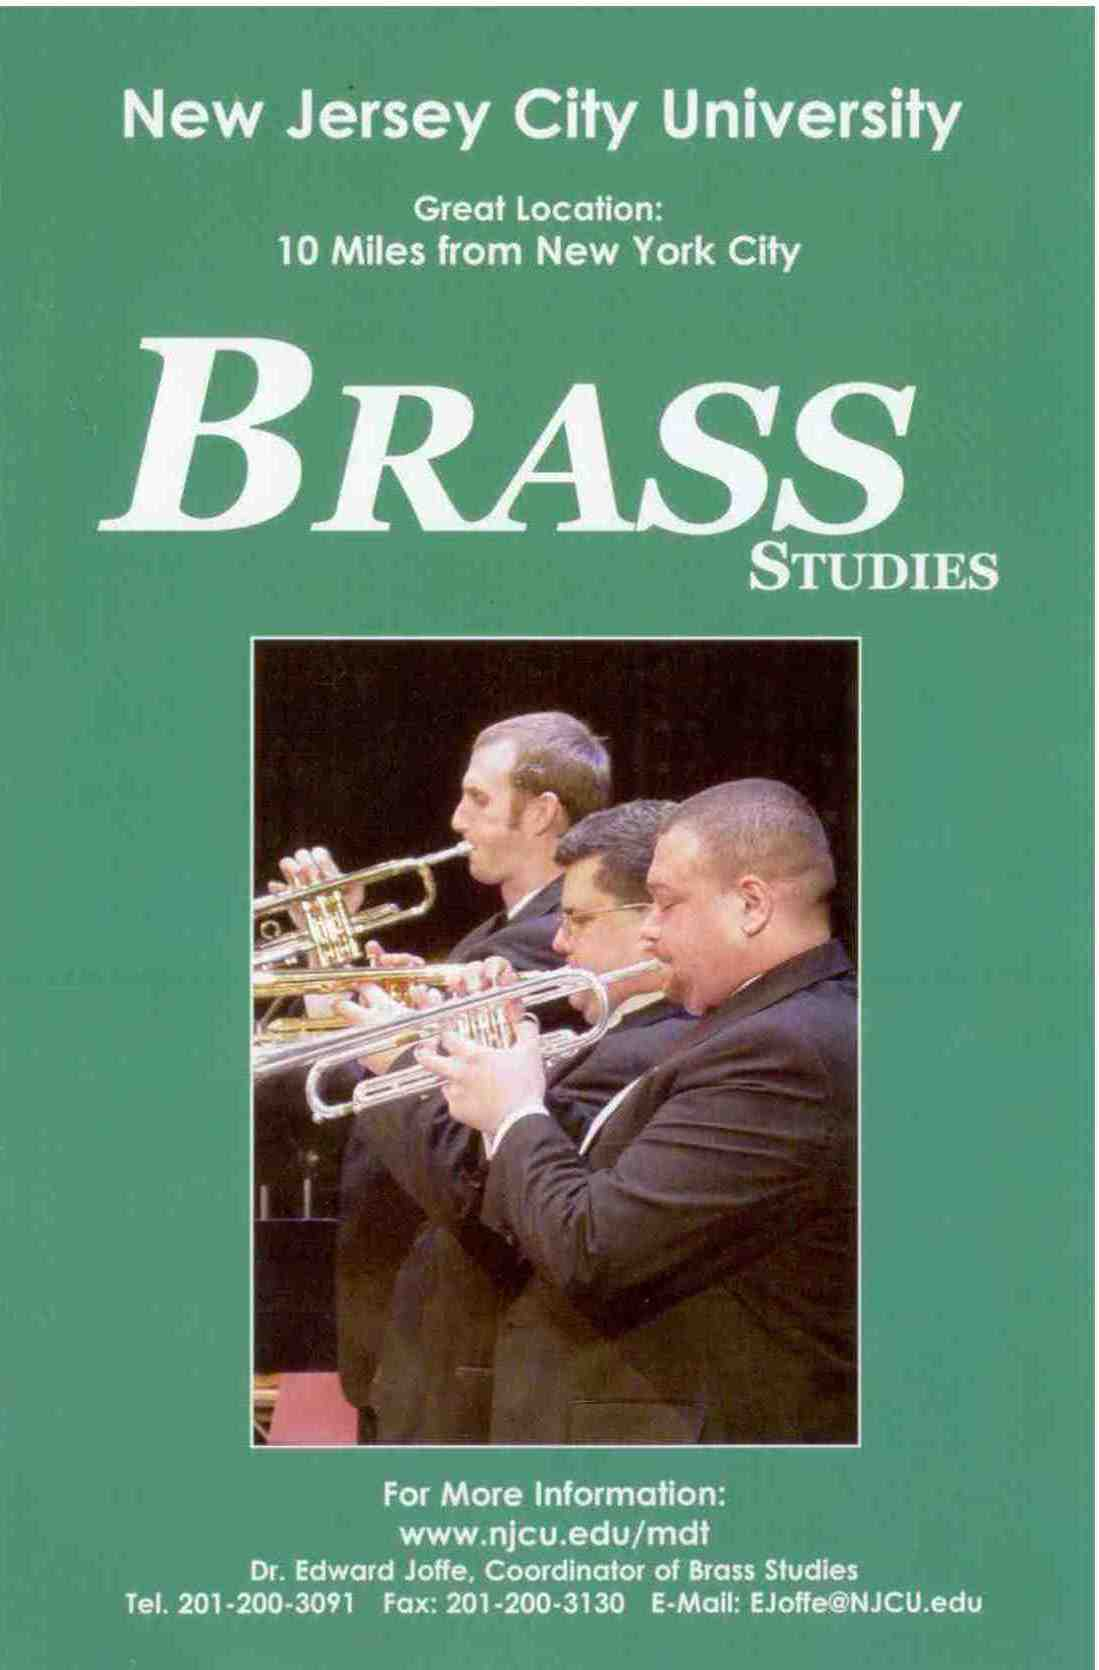 phil-cover-njcu-brass-studies_0.jpg